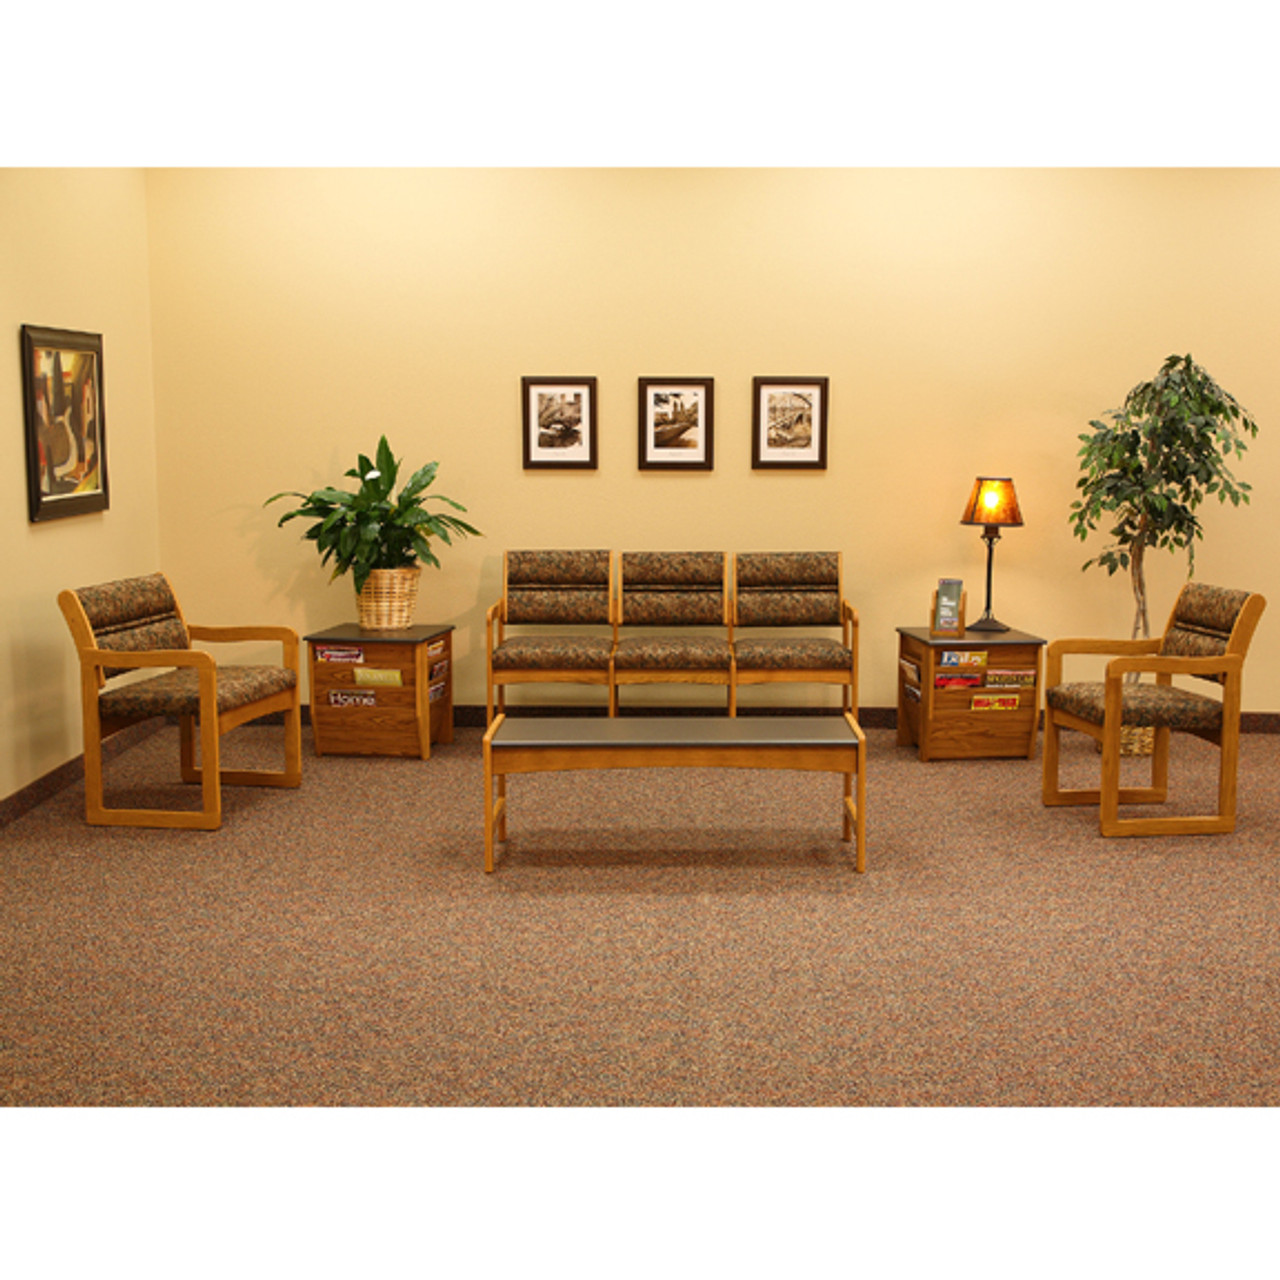 Wooden Mallet Valley Collection Four Seat Sofa, Sled Base, Leaf Blue, Light Oak